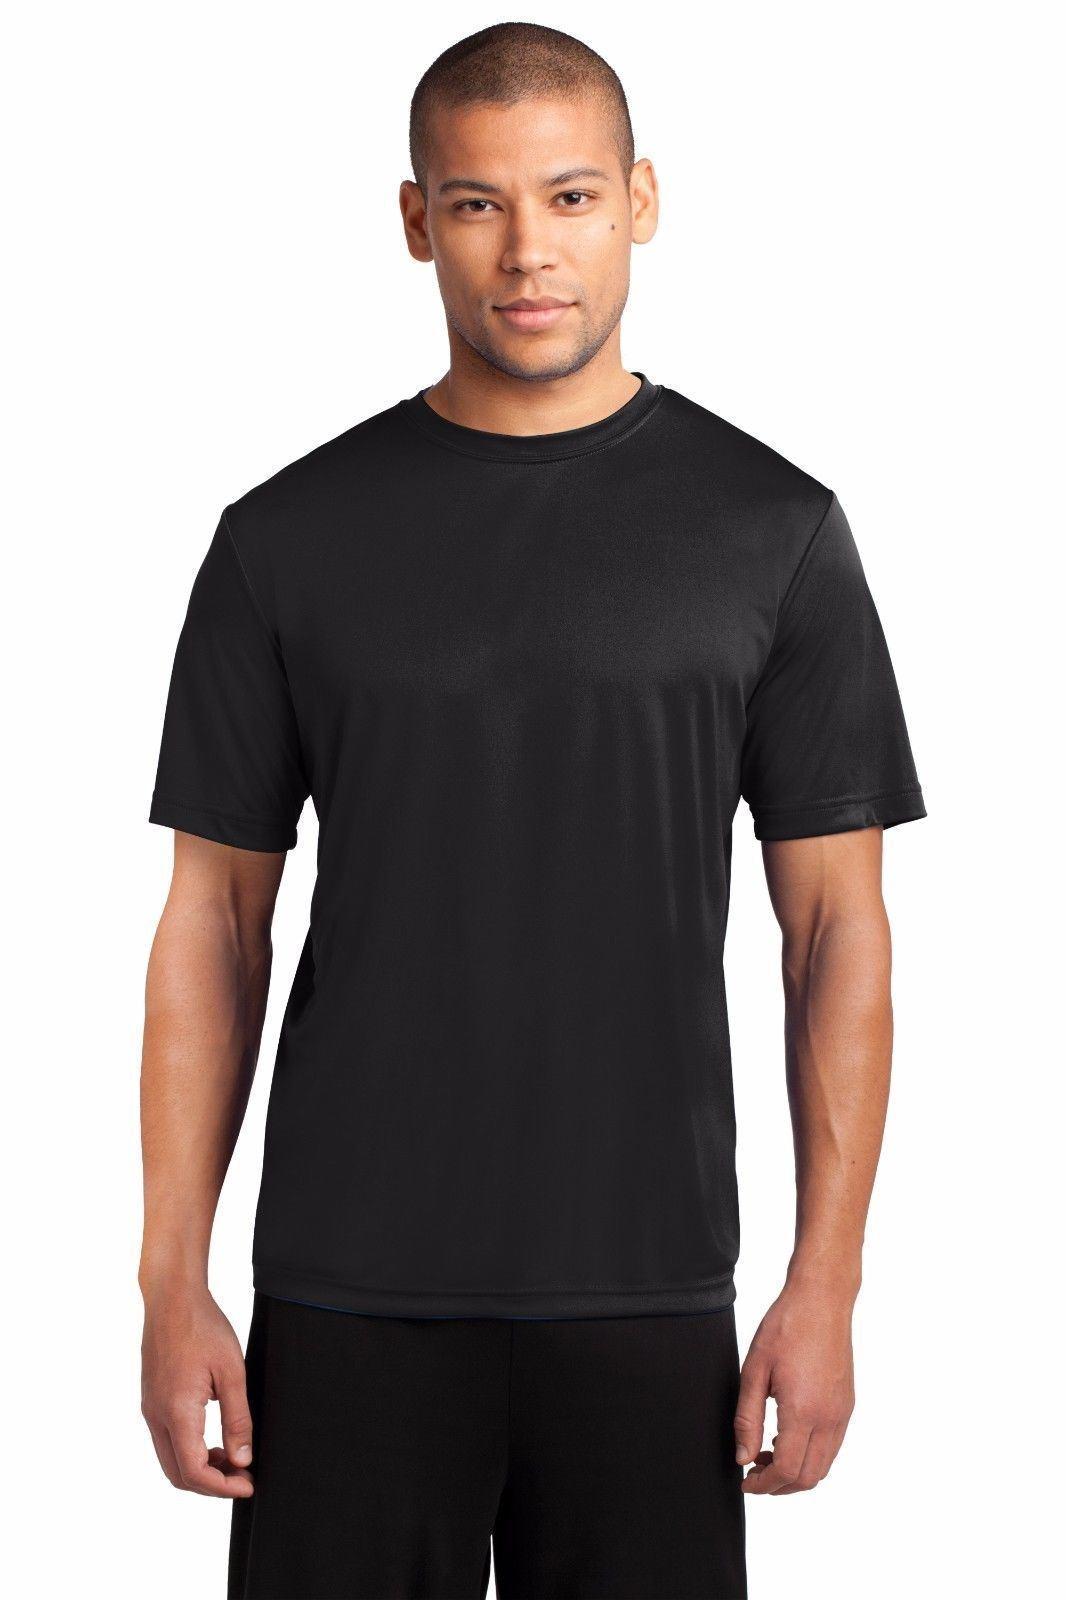 Mens Dri-Fit Workout Performance Moisture Wicking Gym Sport T-Shirt Dry T PC380 Black